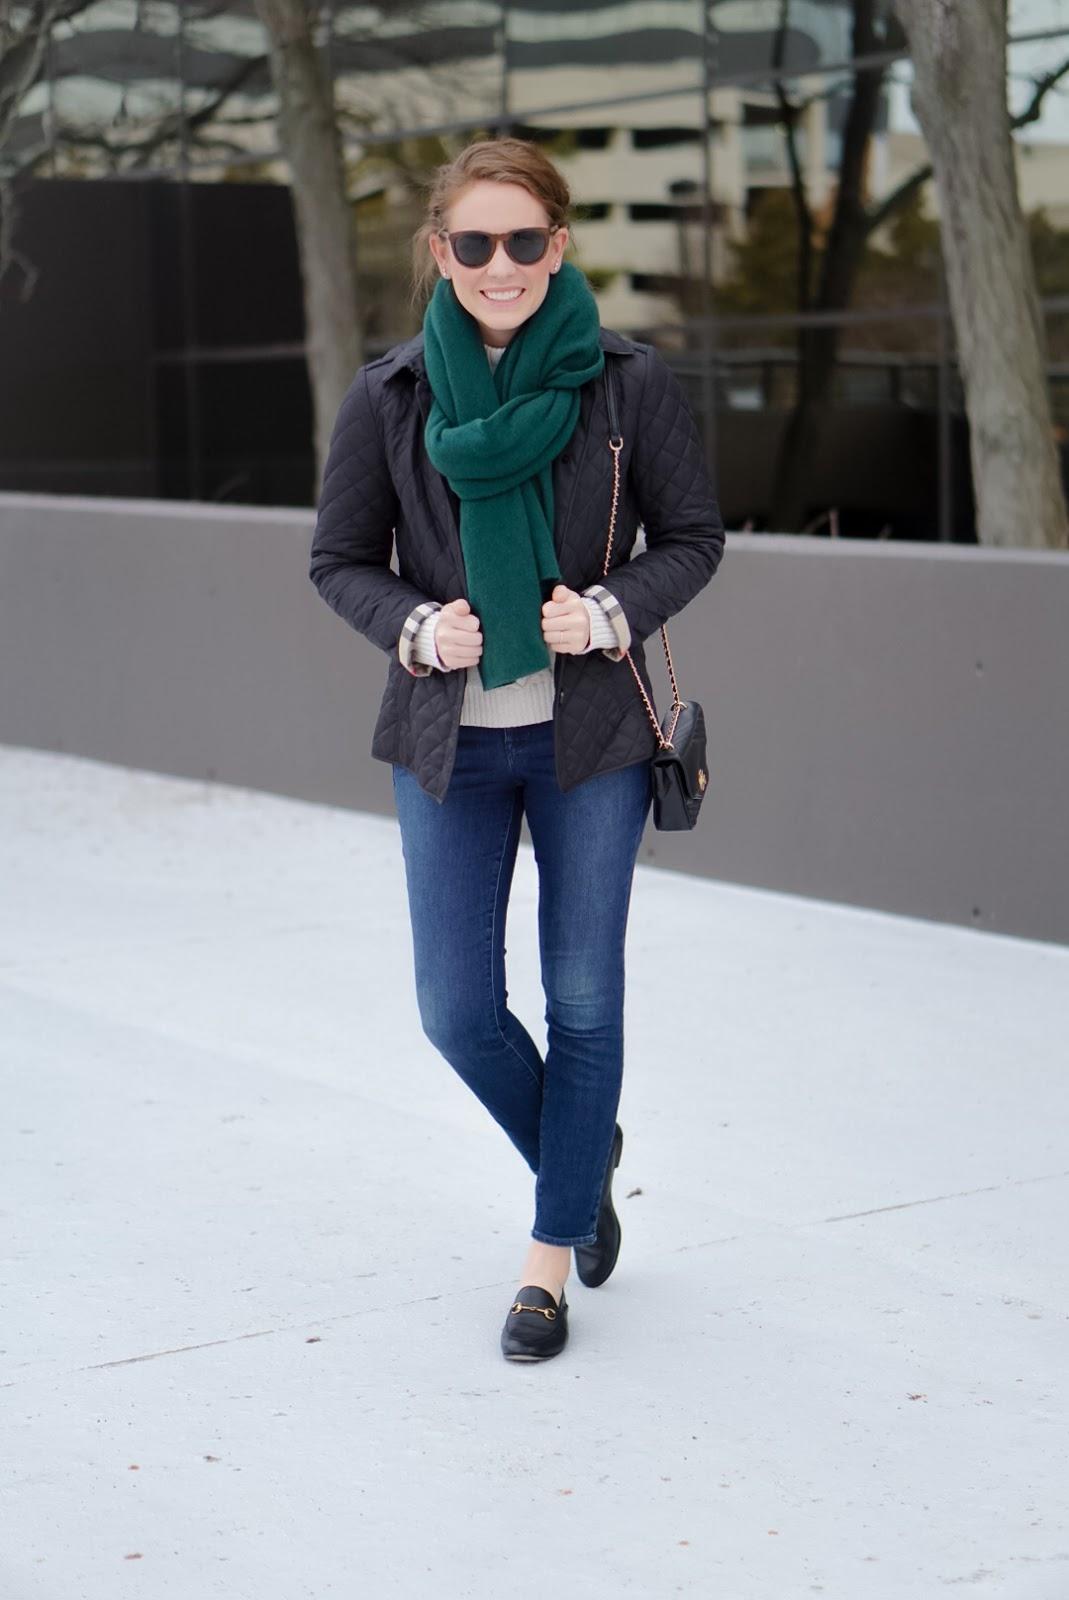 st-louis-fashion-blogger